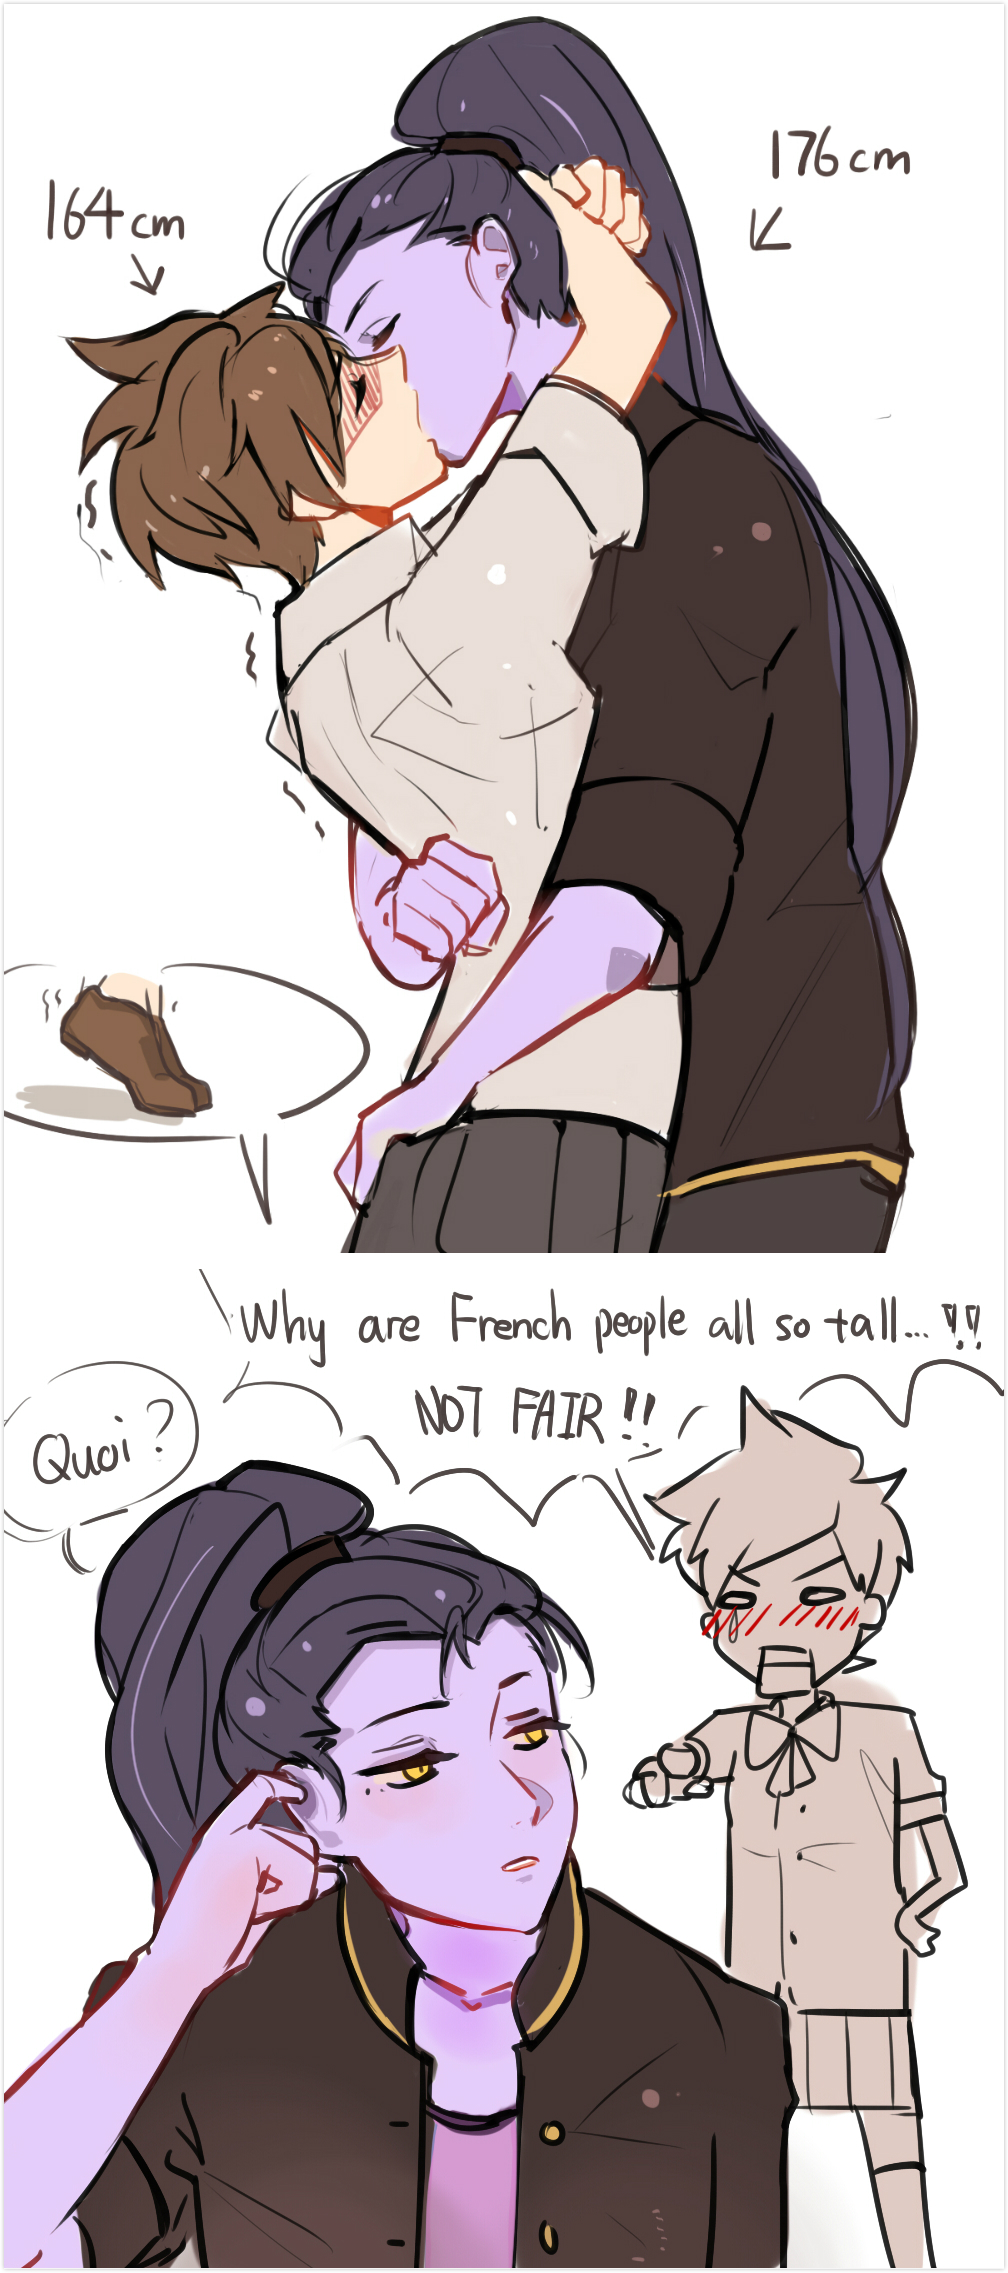 kissing favorite senpaibjmaki on deviantart